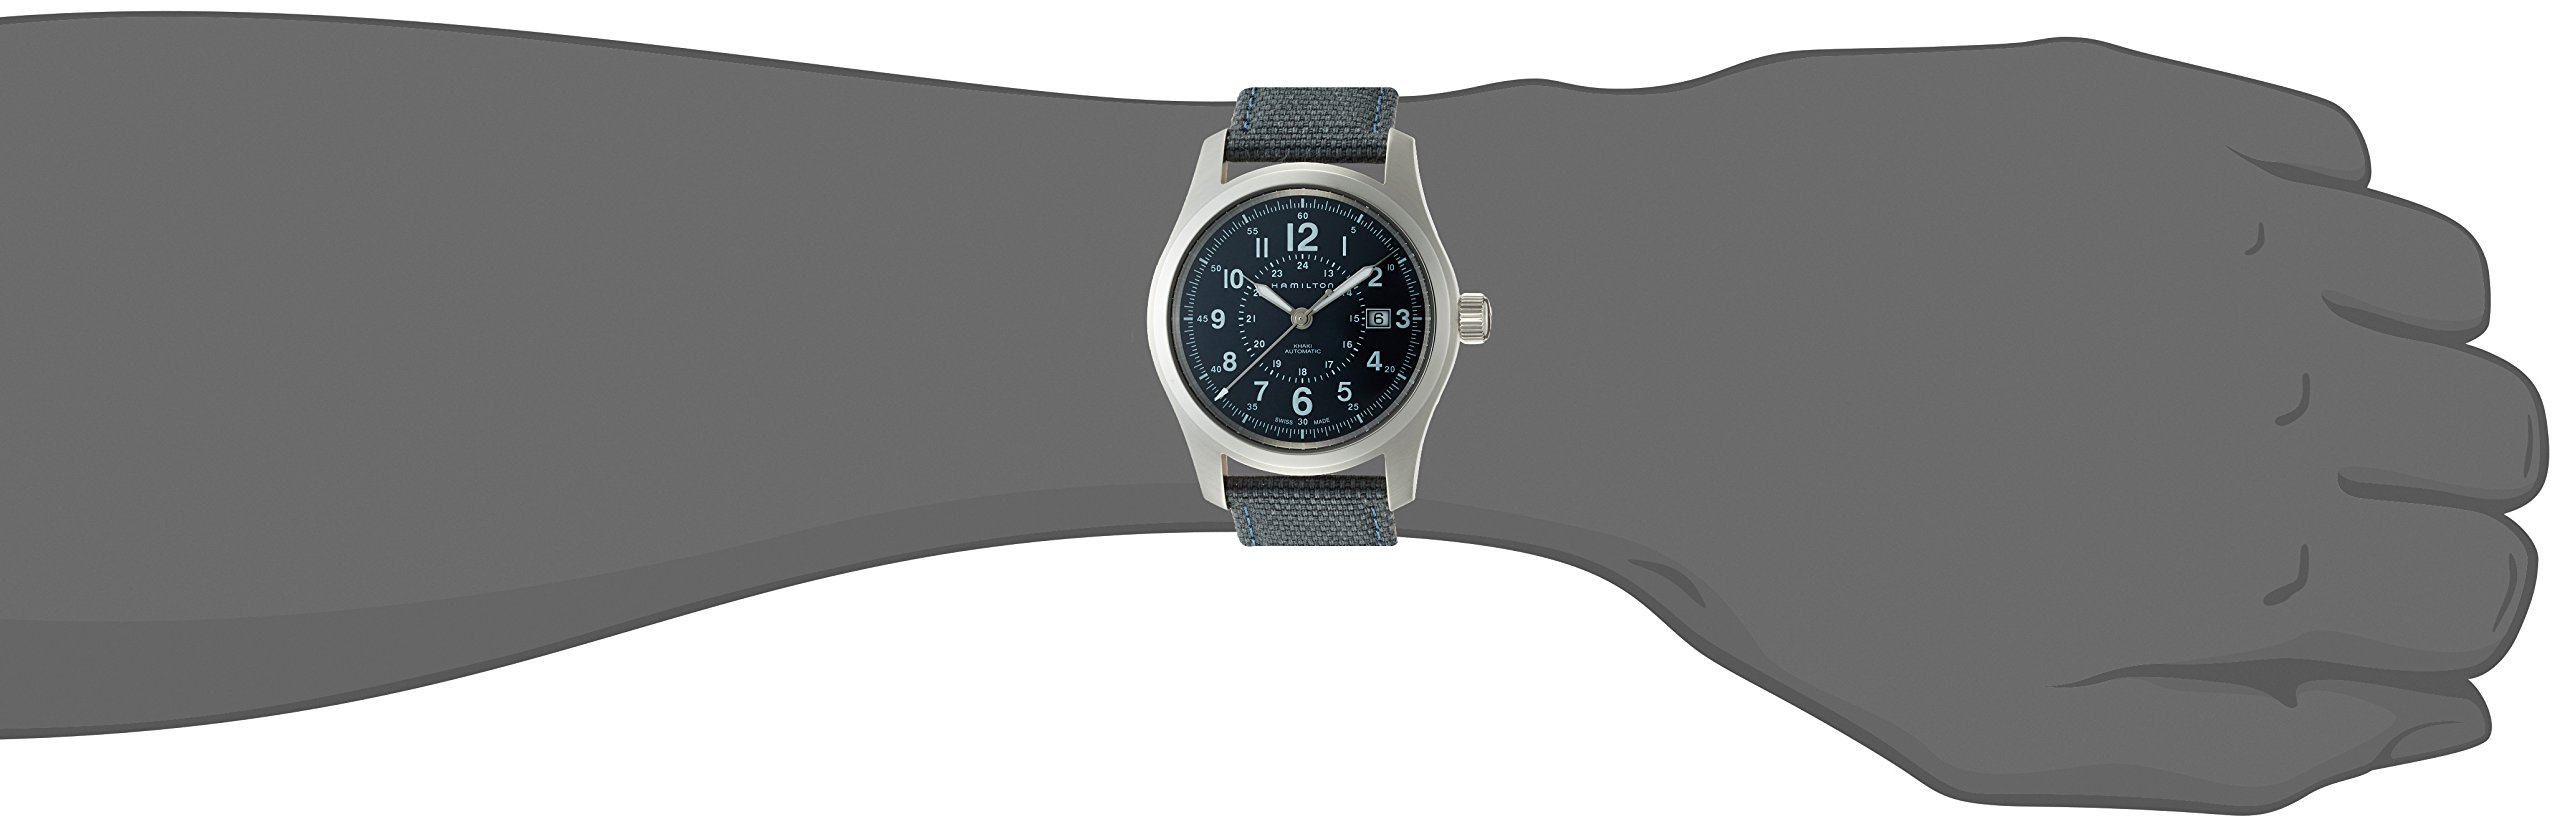 Hamilton H70605943 – Reloj (Reloj de Pulsera, Masculino, Acero Inoxidable,